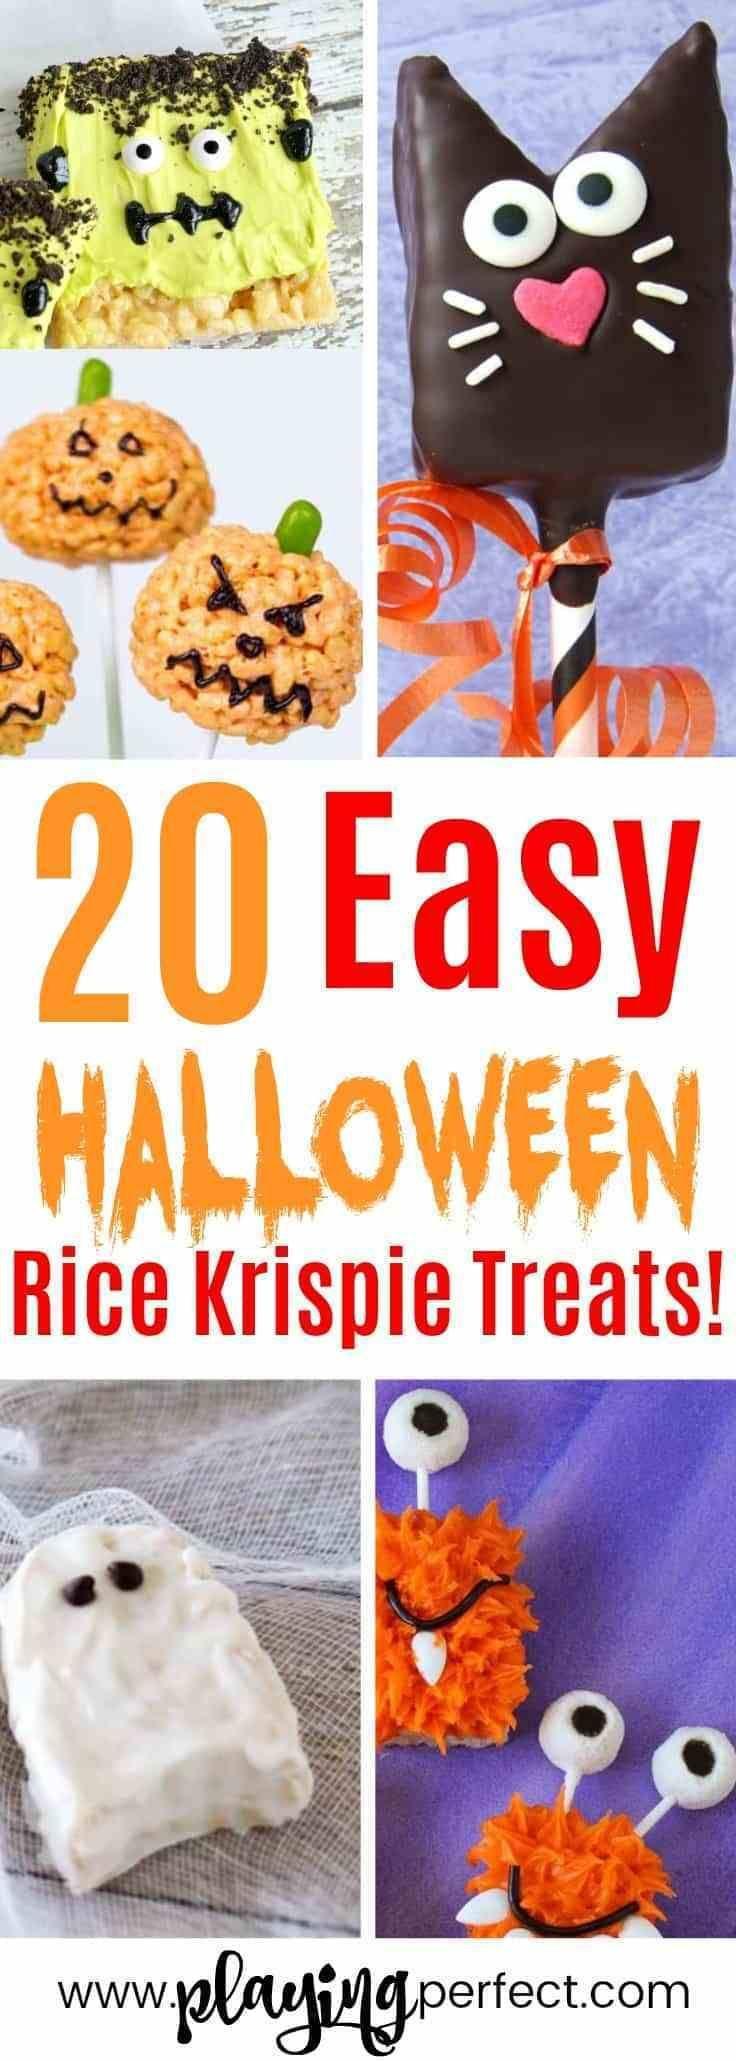 20 Of The Best Halloween Rice Krispie Treats #halloweenricekrispietreatsideas